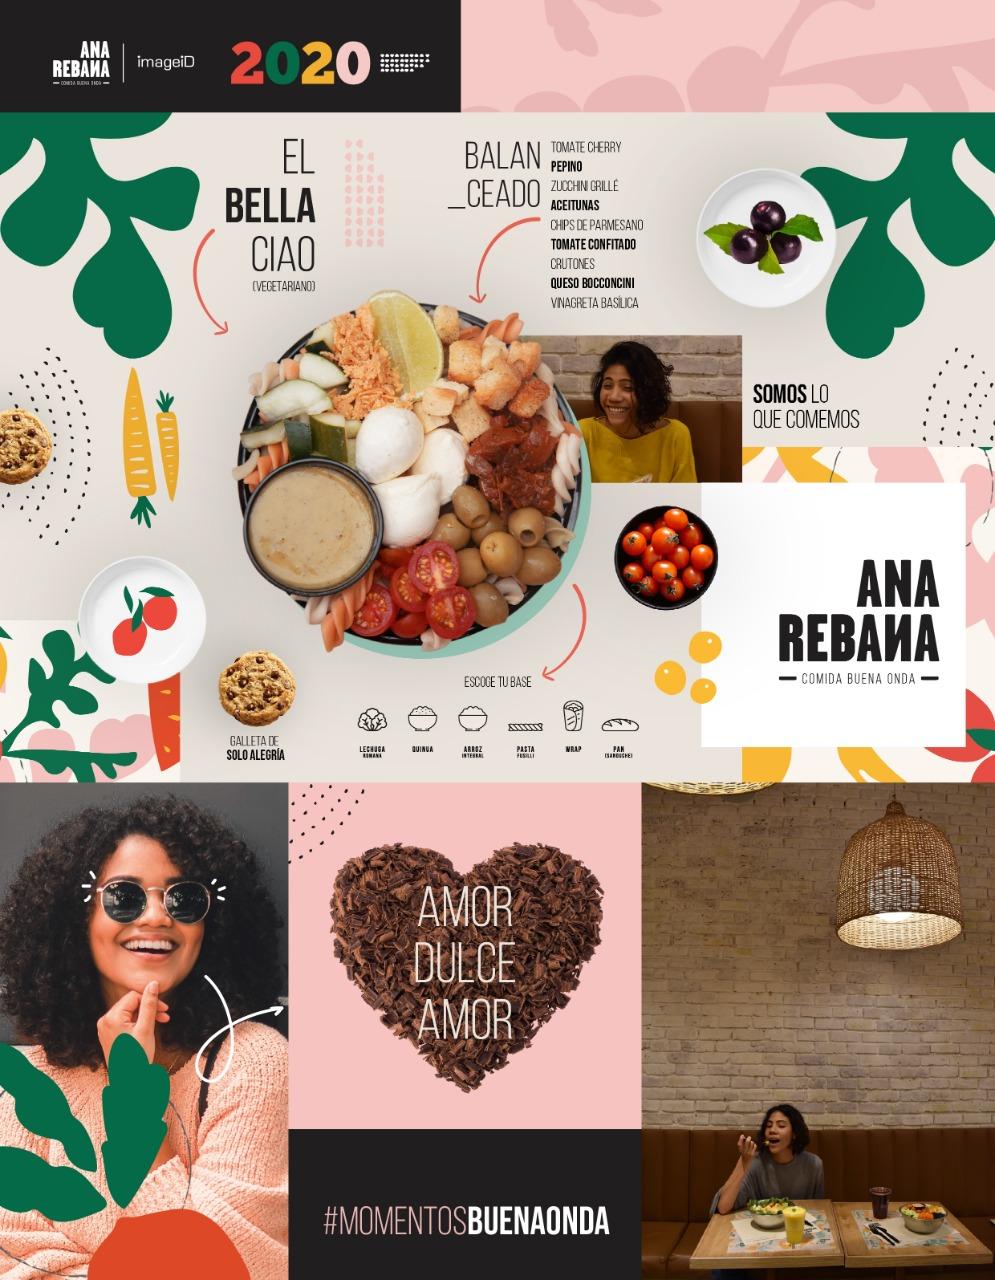 Ana Rebana – Redes